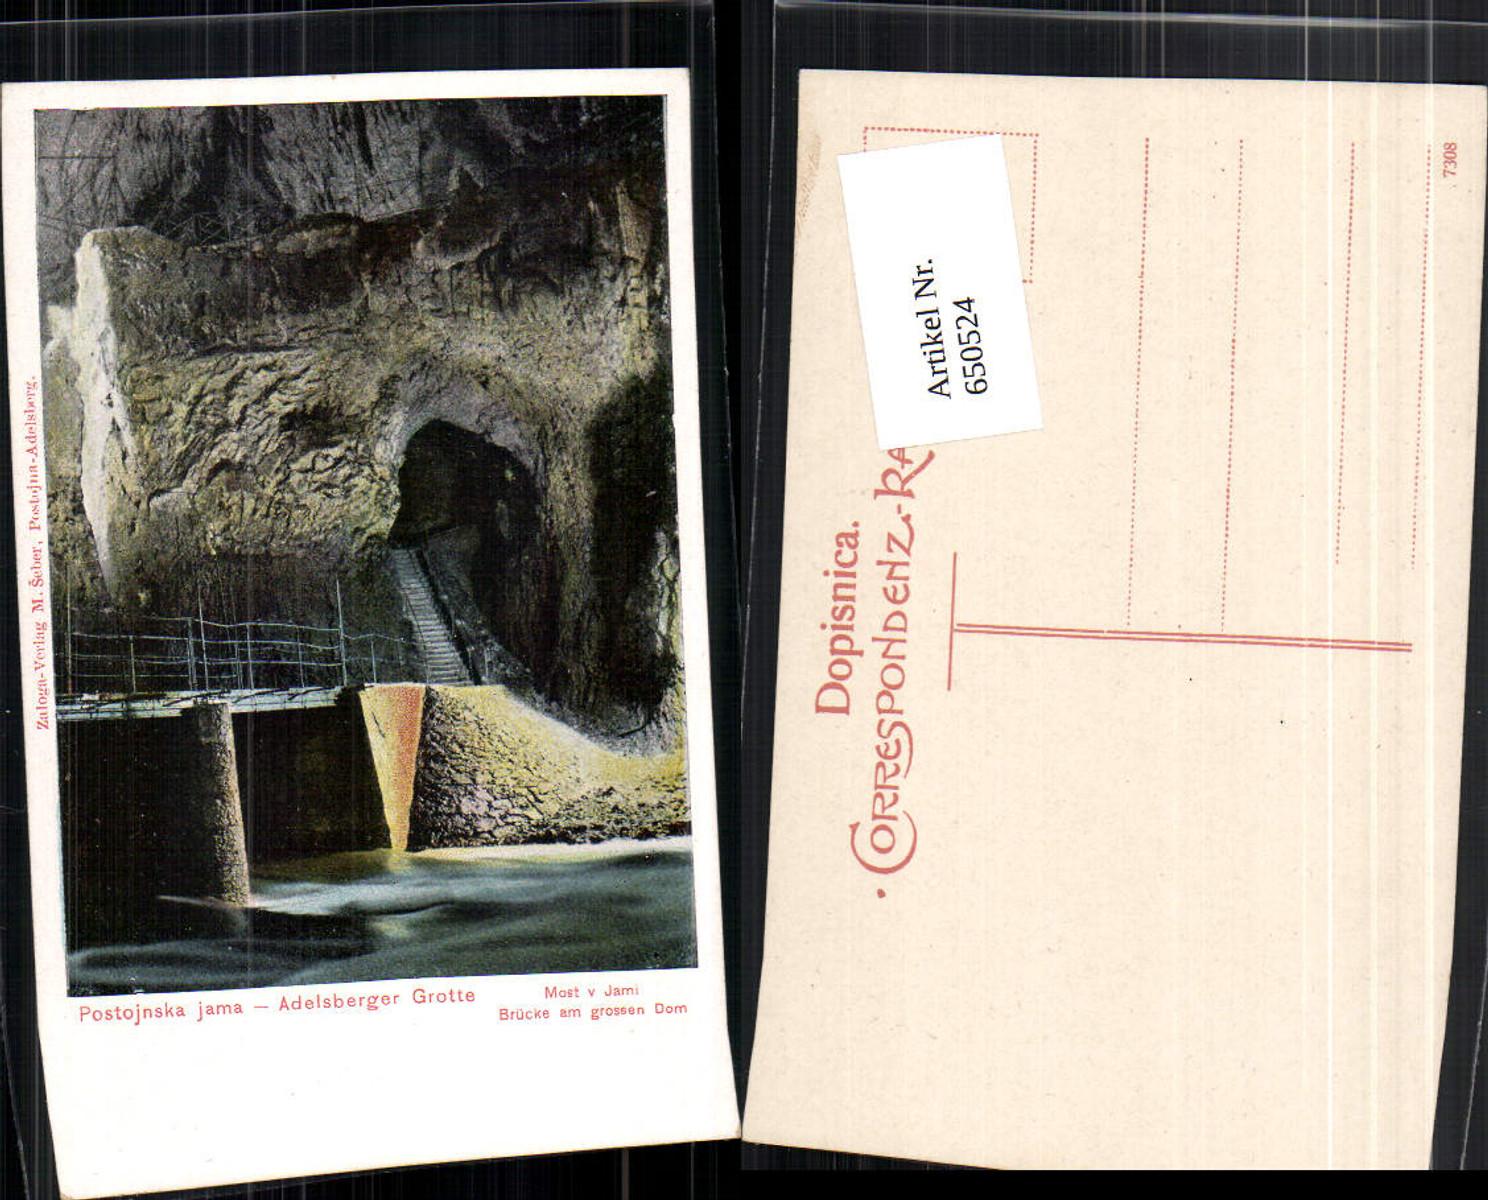 650524,Postojnska jama Adelsberger Grotte Adelsberg Postojna  günstig online kaufen